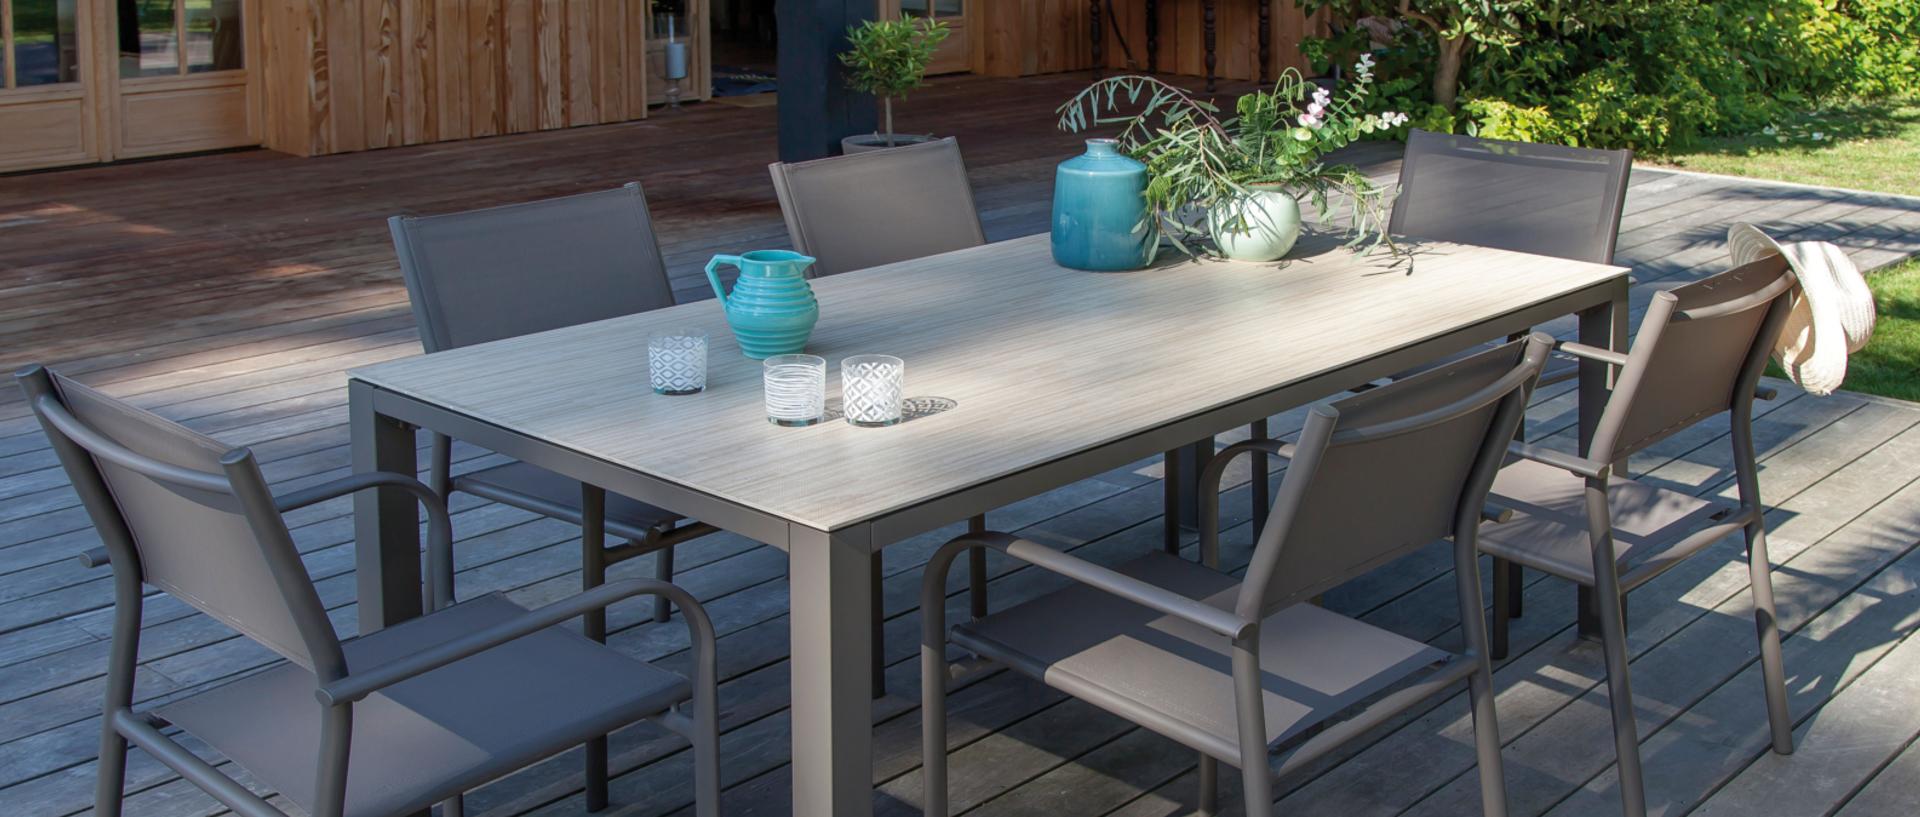 Table Bavella + fauteuils Duca